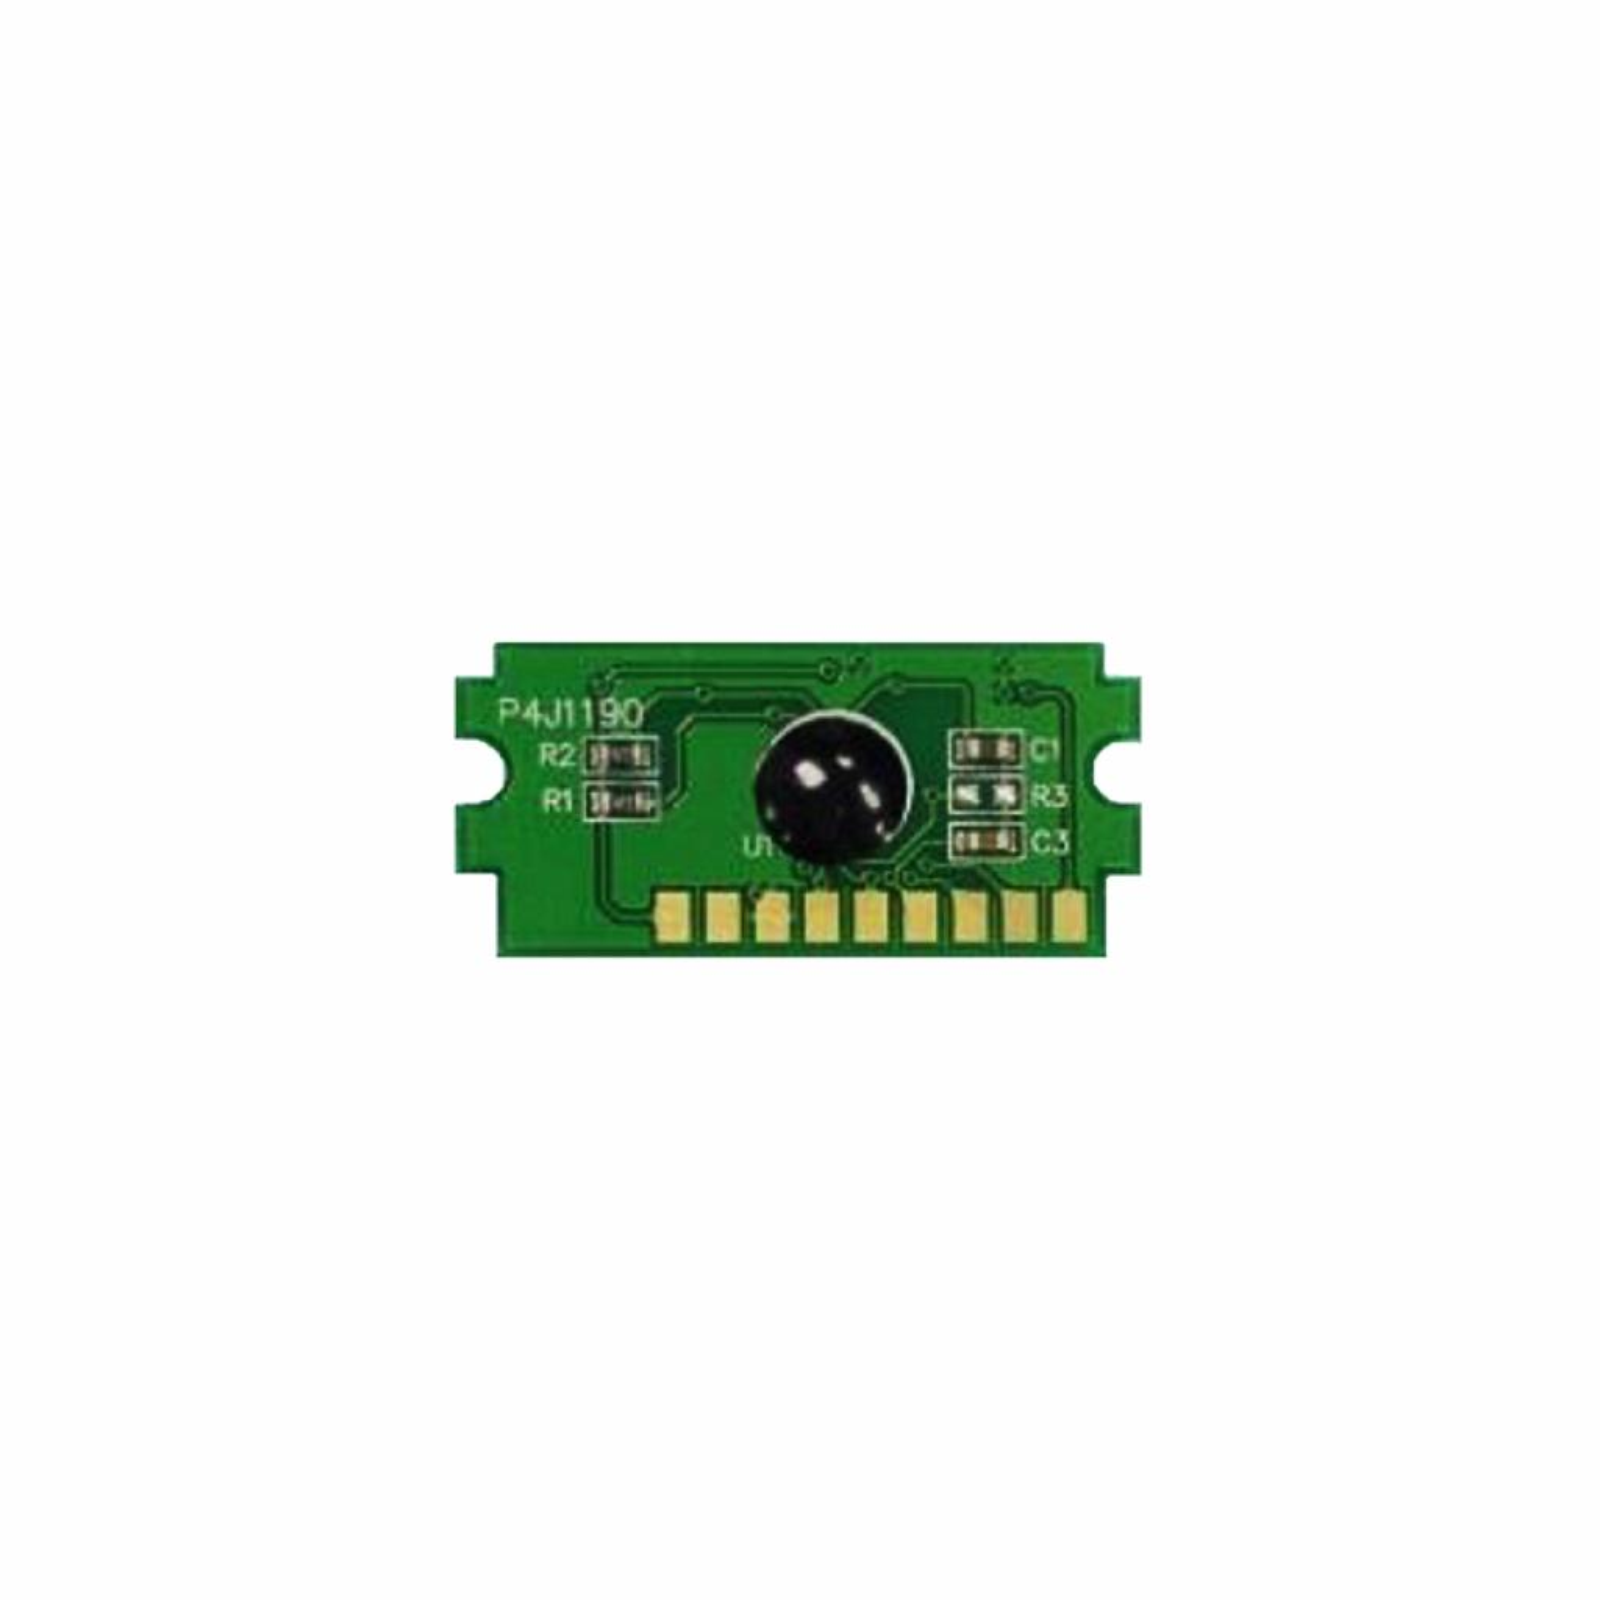 Чип для картриджа Kyocera TK-5140C (EU) 5k cyan Static Control (TK5140CP-CEU)